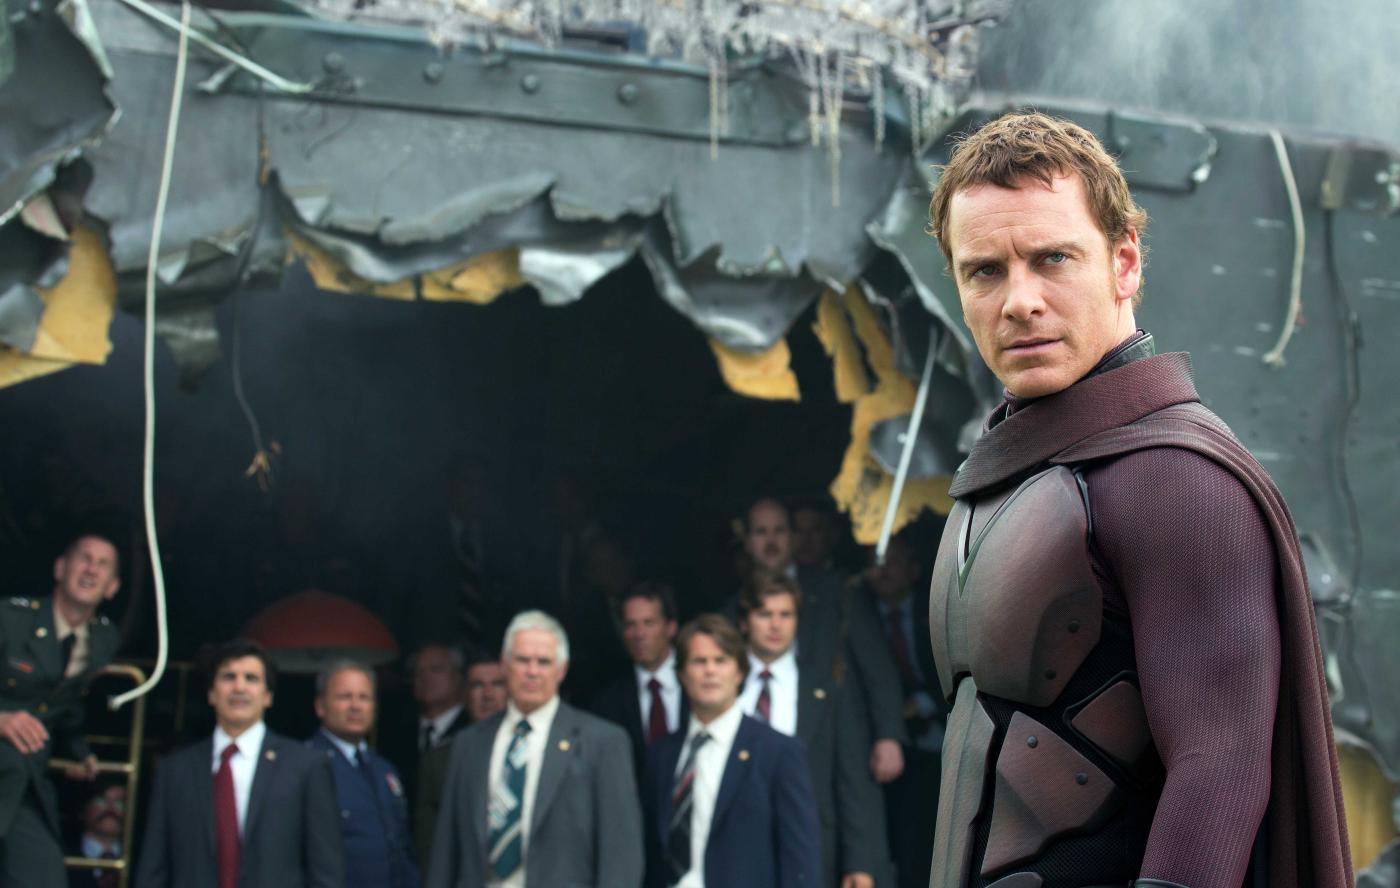 Hat er etwa JFK ermordet? Erik Lehnsherr alias Magneto (Michael Fassbender) im neuen 'X-Men'